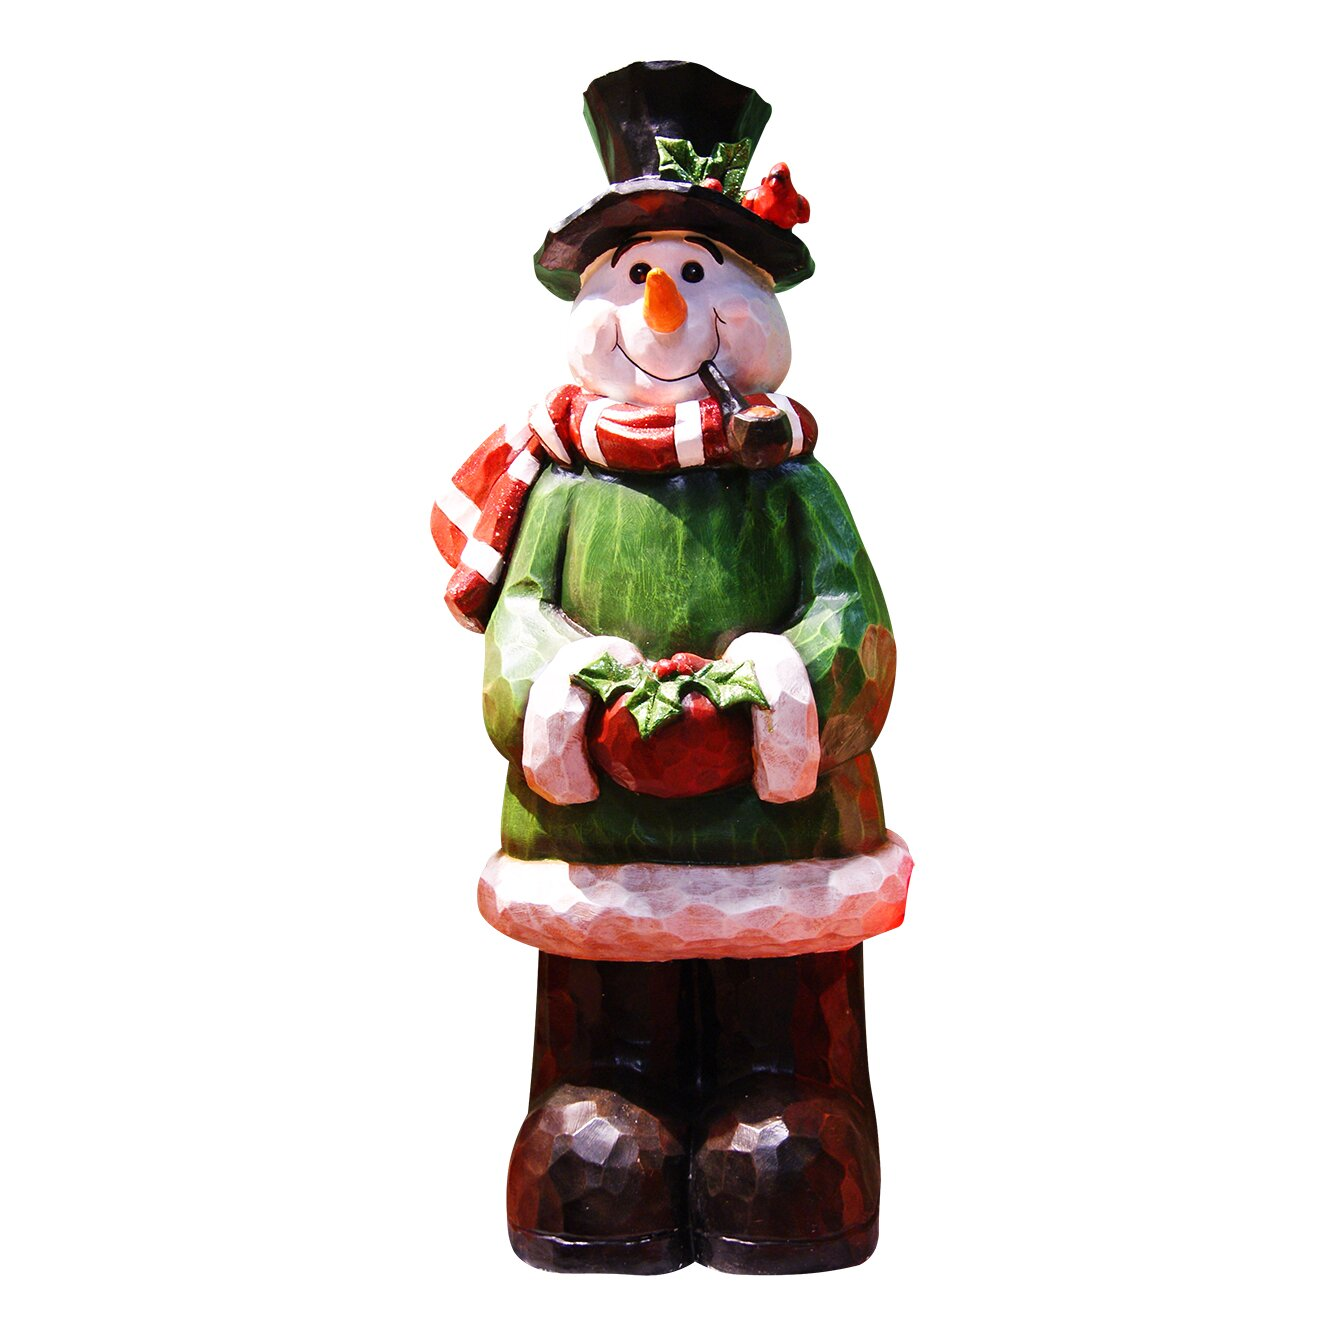 Christmas Statue Decorations: Alpine Snowman Garden Statue Christmas Decoration